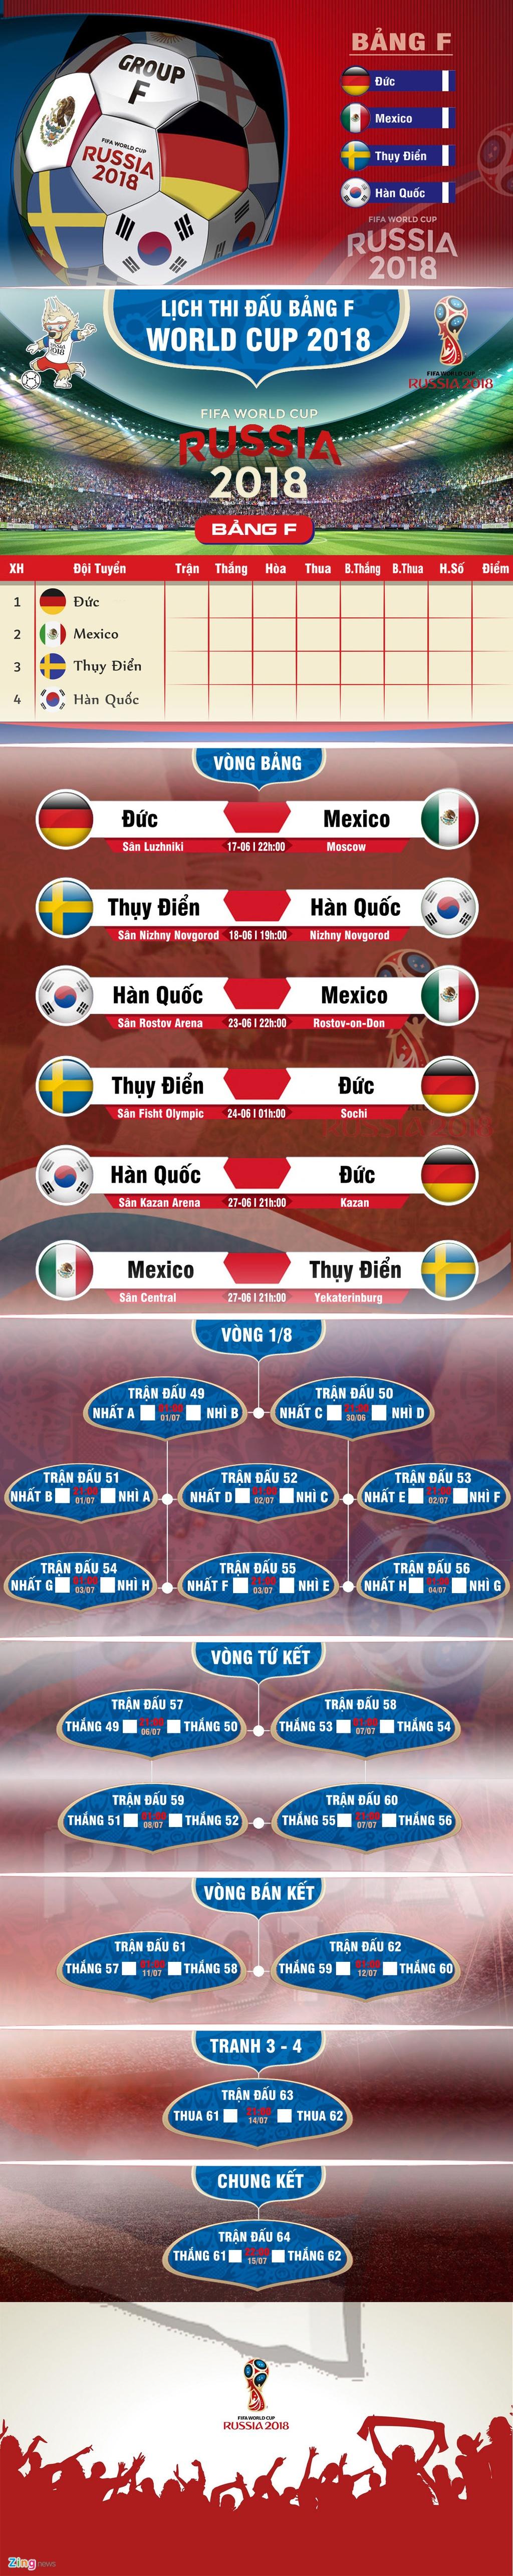 Lich thi dau bang F o World Cup 2018: Kho can duong kim vo dich Duc hinh anh 1